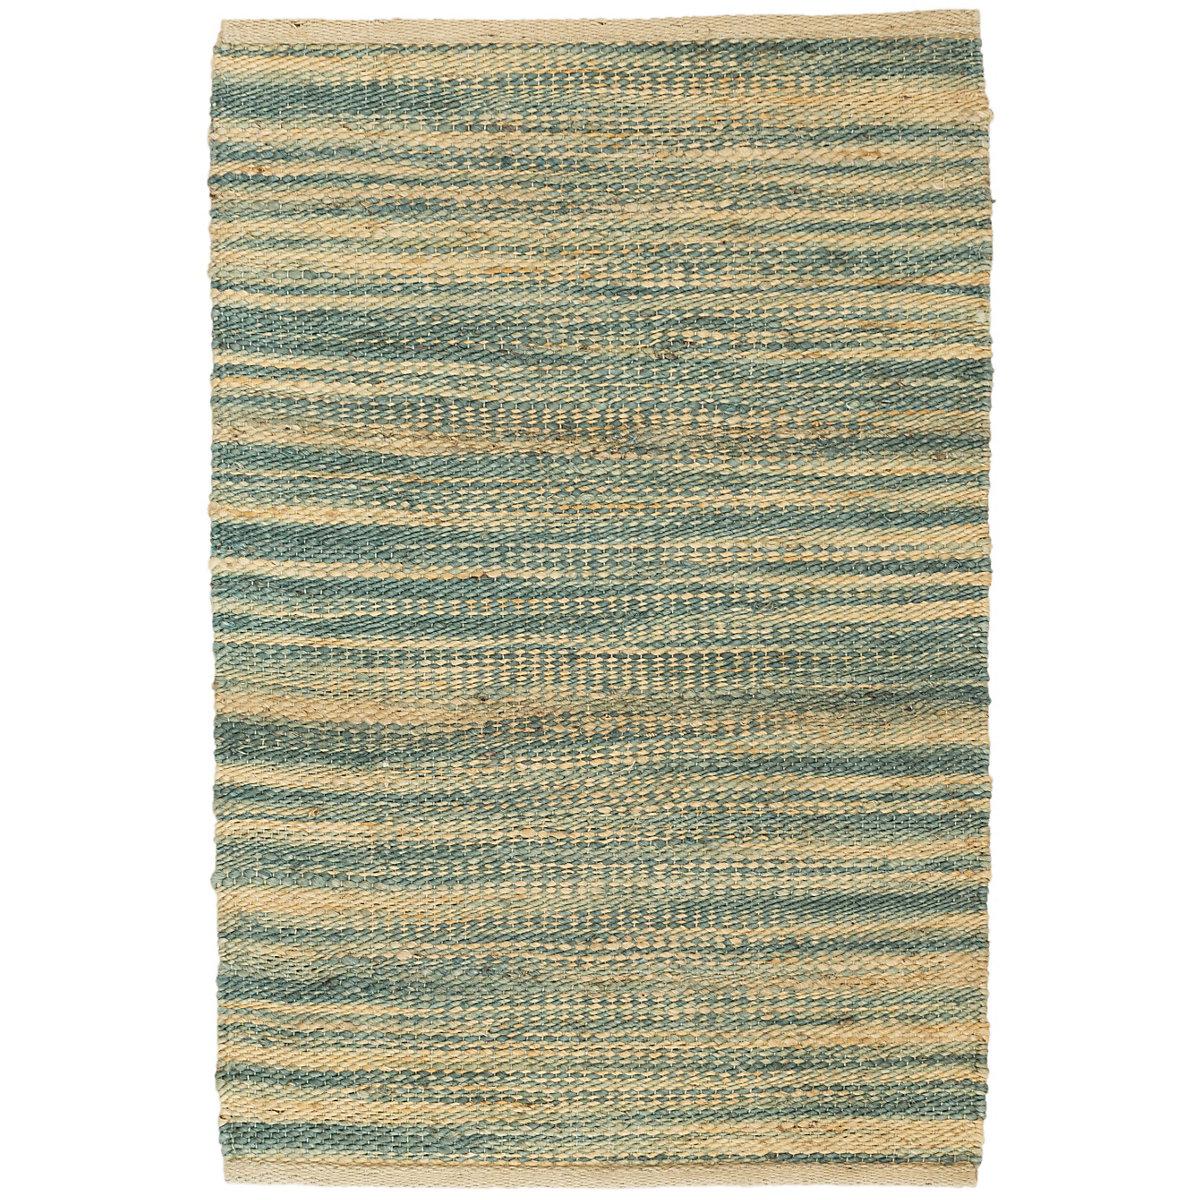 Haze seaglass jute woven rug dash albert for Dash and albert blankets